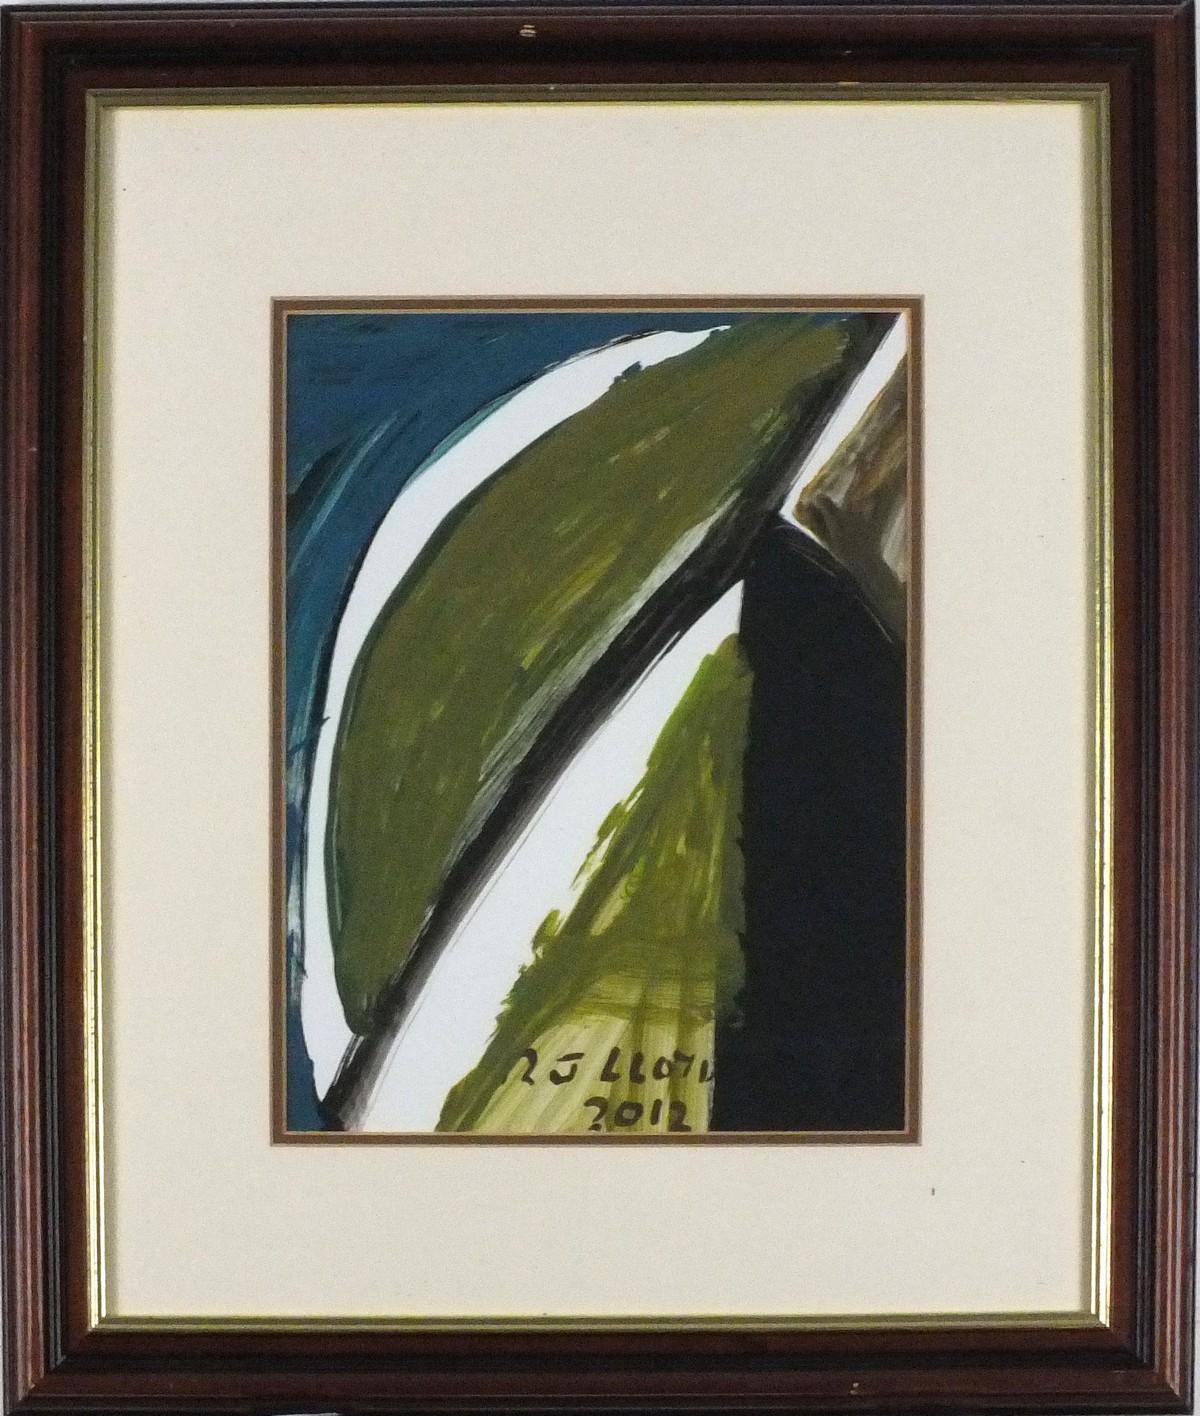 Lot 41 - Reginald James LLOYD (British b. 1926) Cliff Slide, Oil on paper, Signed and dated 2012 bottom